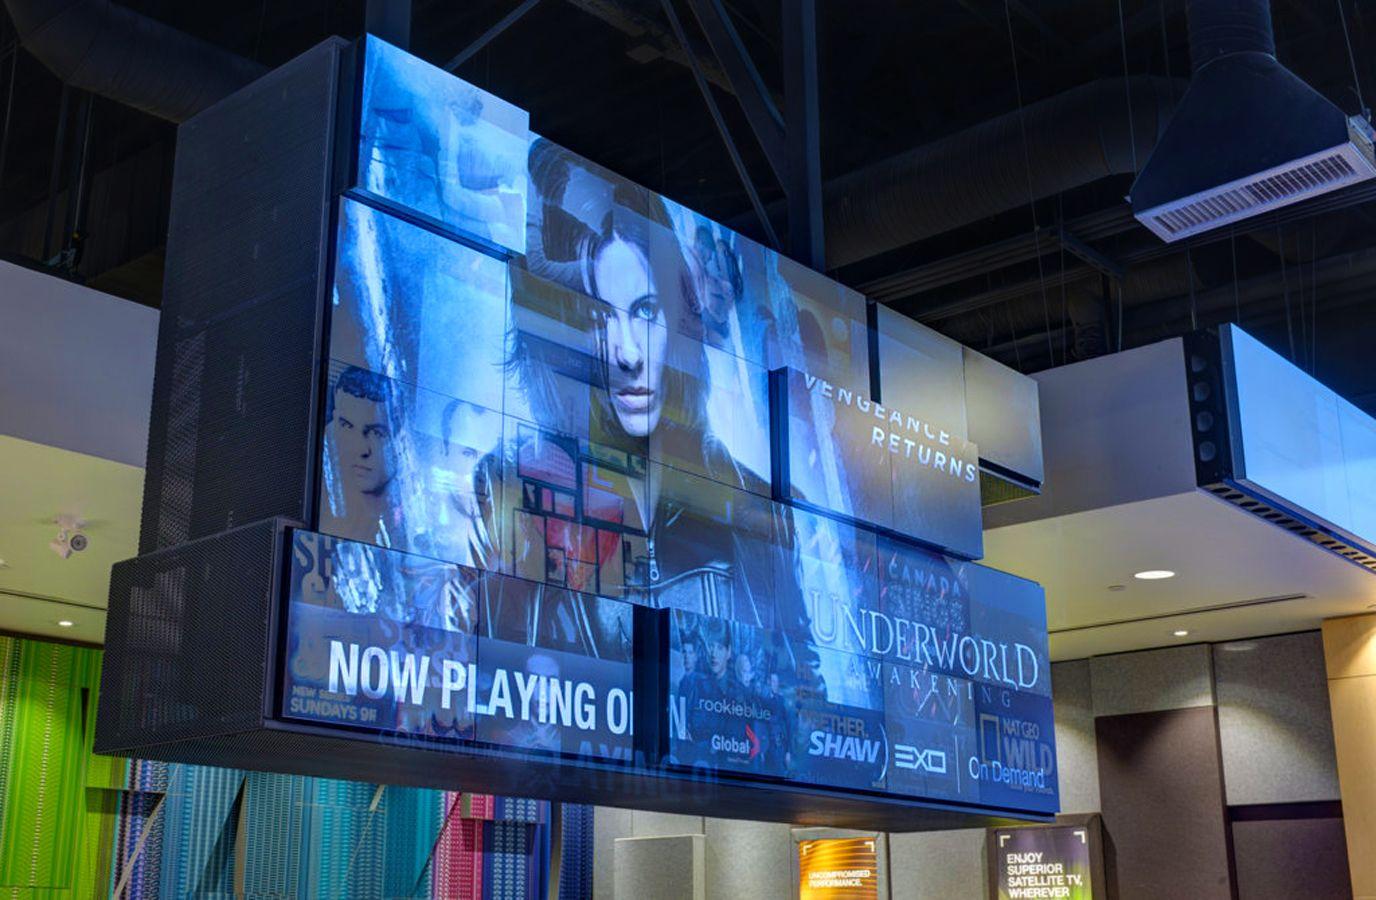 Modular Digital Signage Display Creates Visual Waterfall